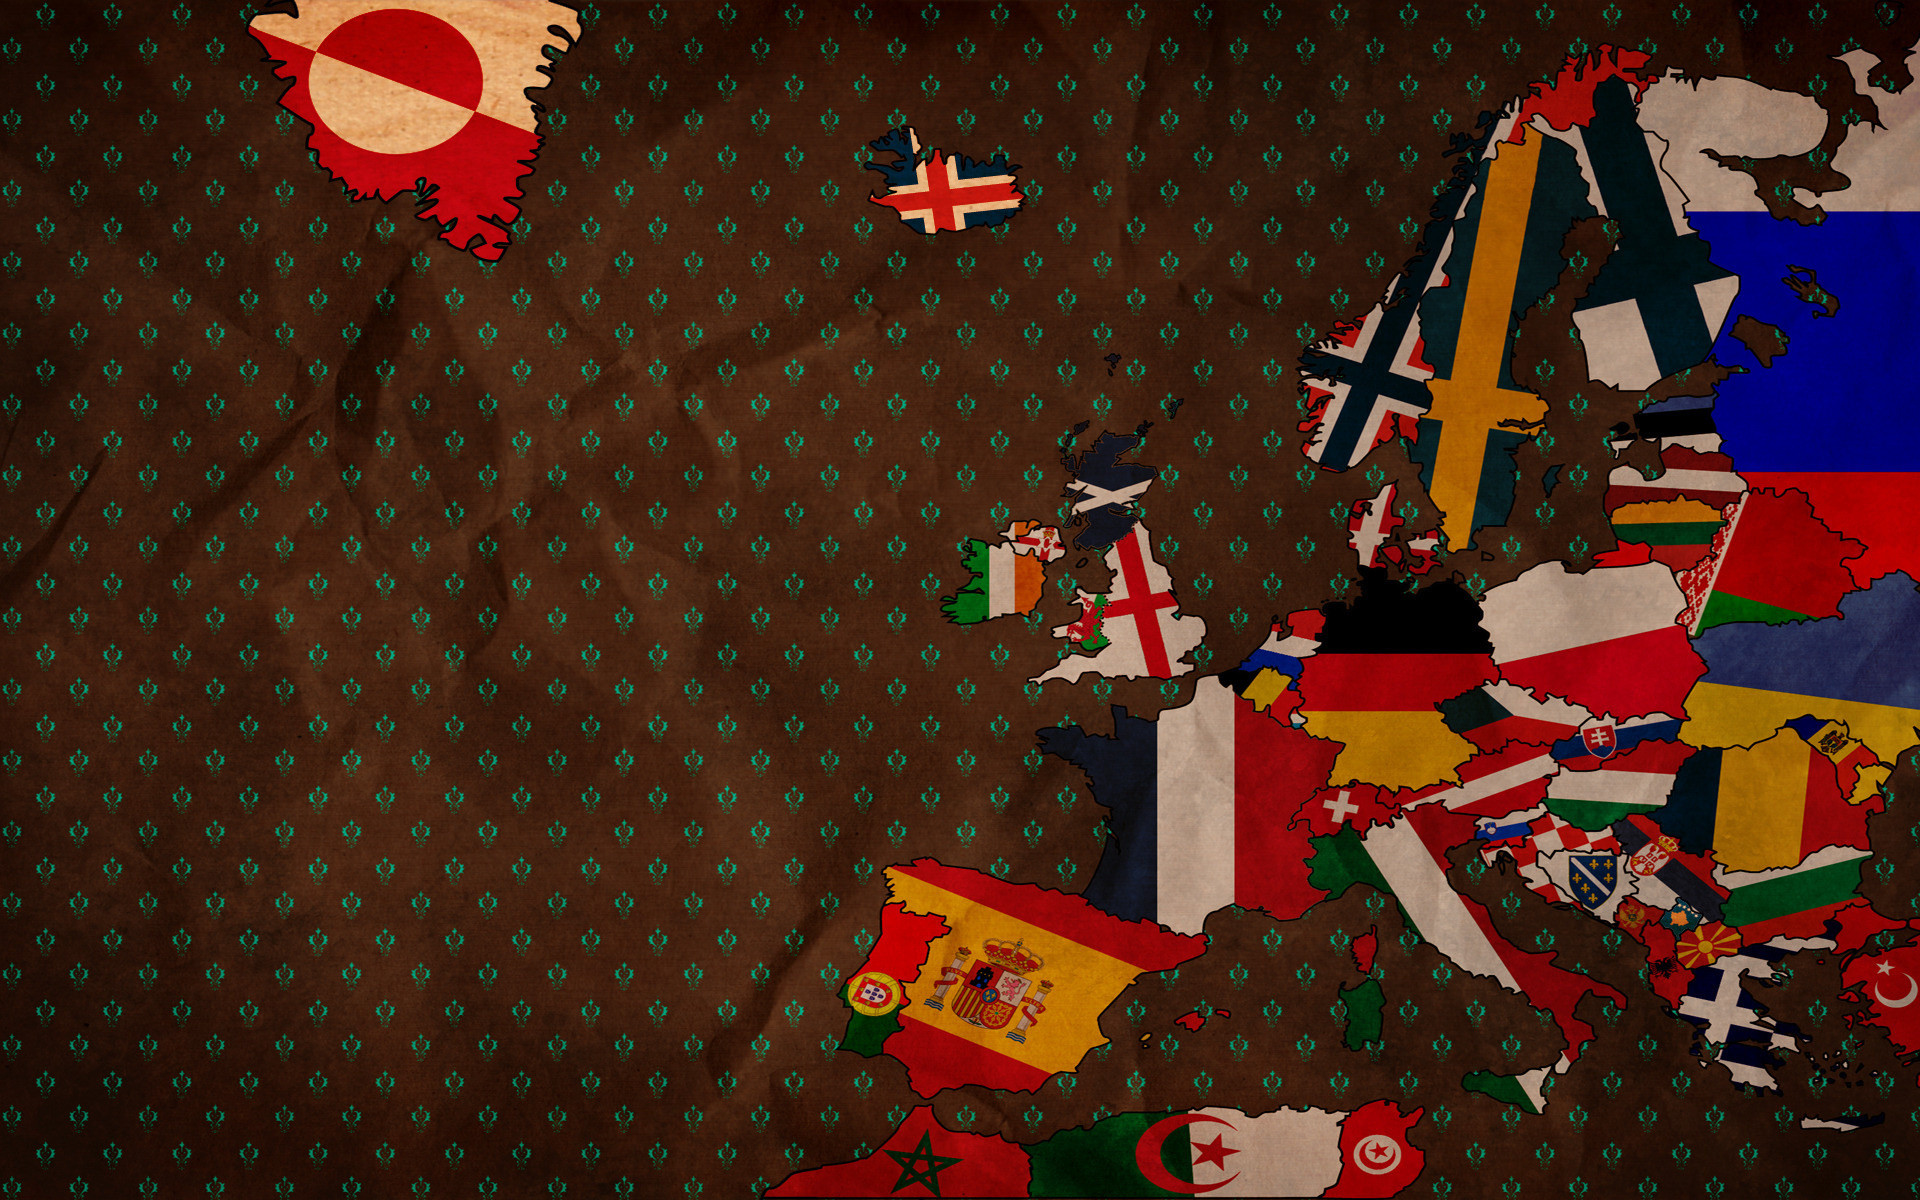 World flags wallpaper 61 images 1920x1080 high resolution world map countries flag desktop wallpaper gumiabroncs Gallery